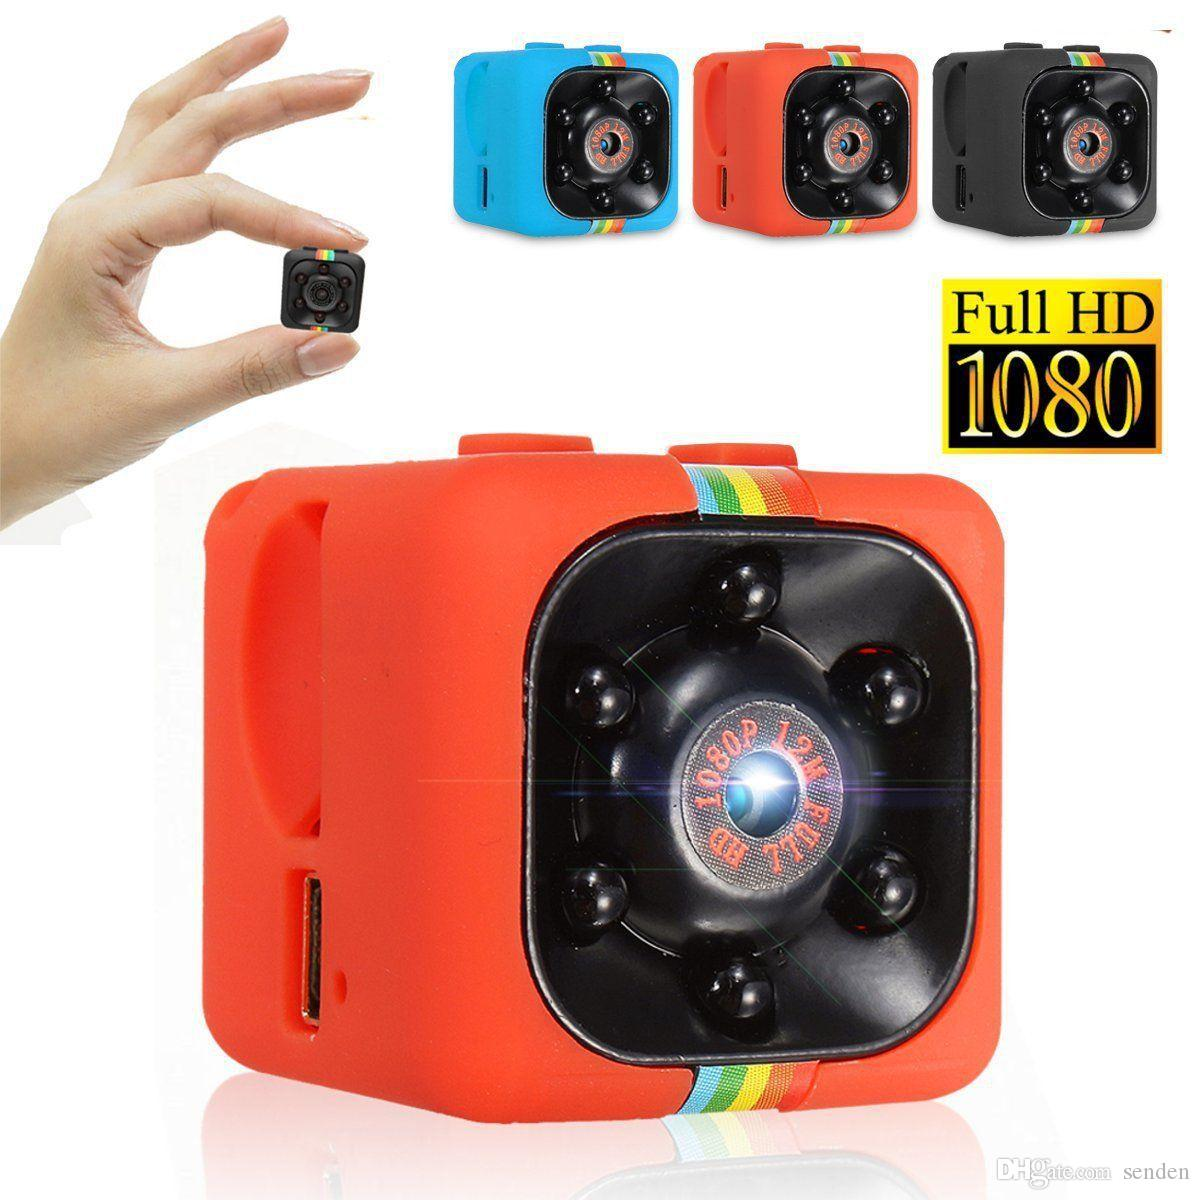 SQ11 كاميرا مصغرة HD 1080P للرؤية الليلية كاميرا مصغرة عمل كاميرا فيديو DV تسجيل صوتي كاميرا مايكرو